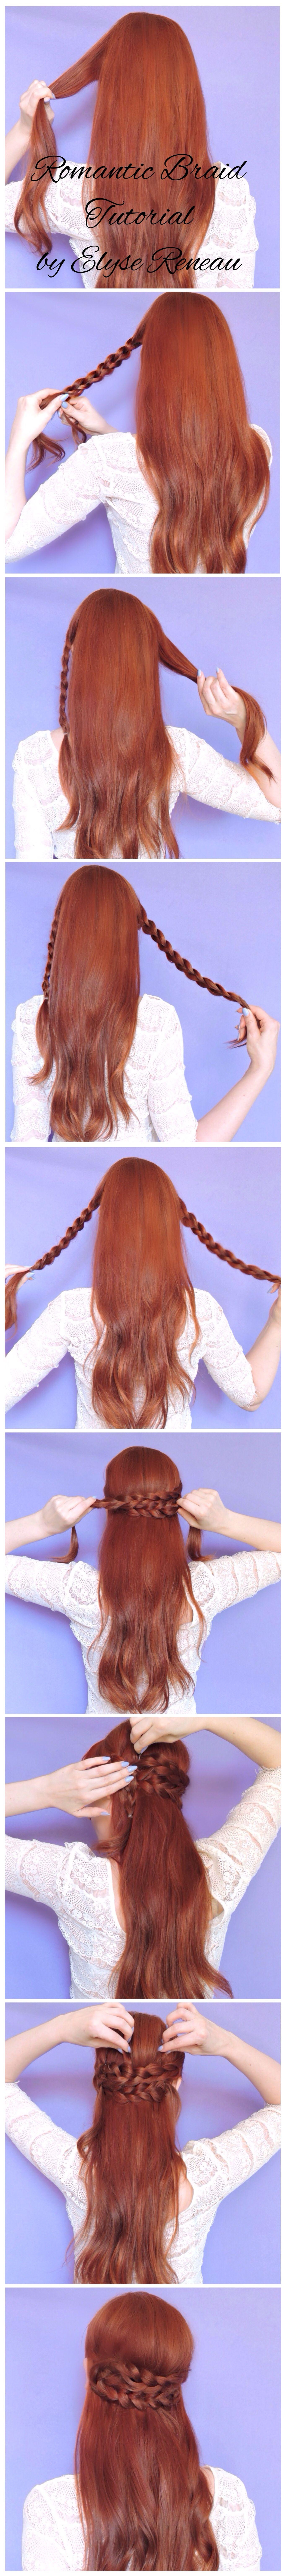 Easy datenight hair romantic braid tutorial peinados pinterest